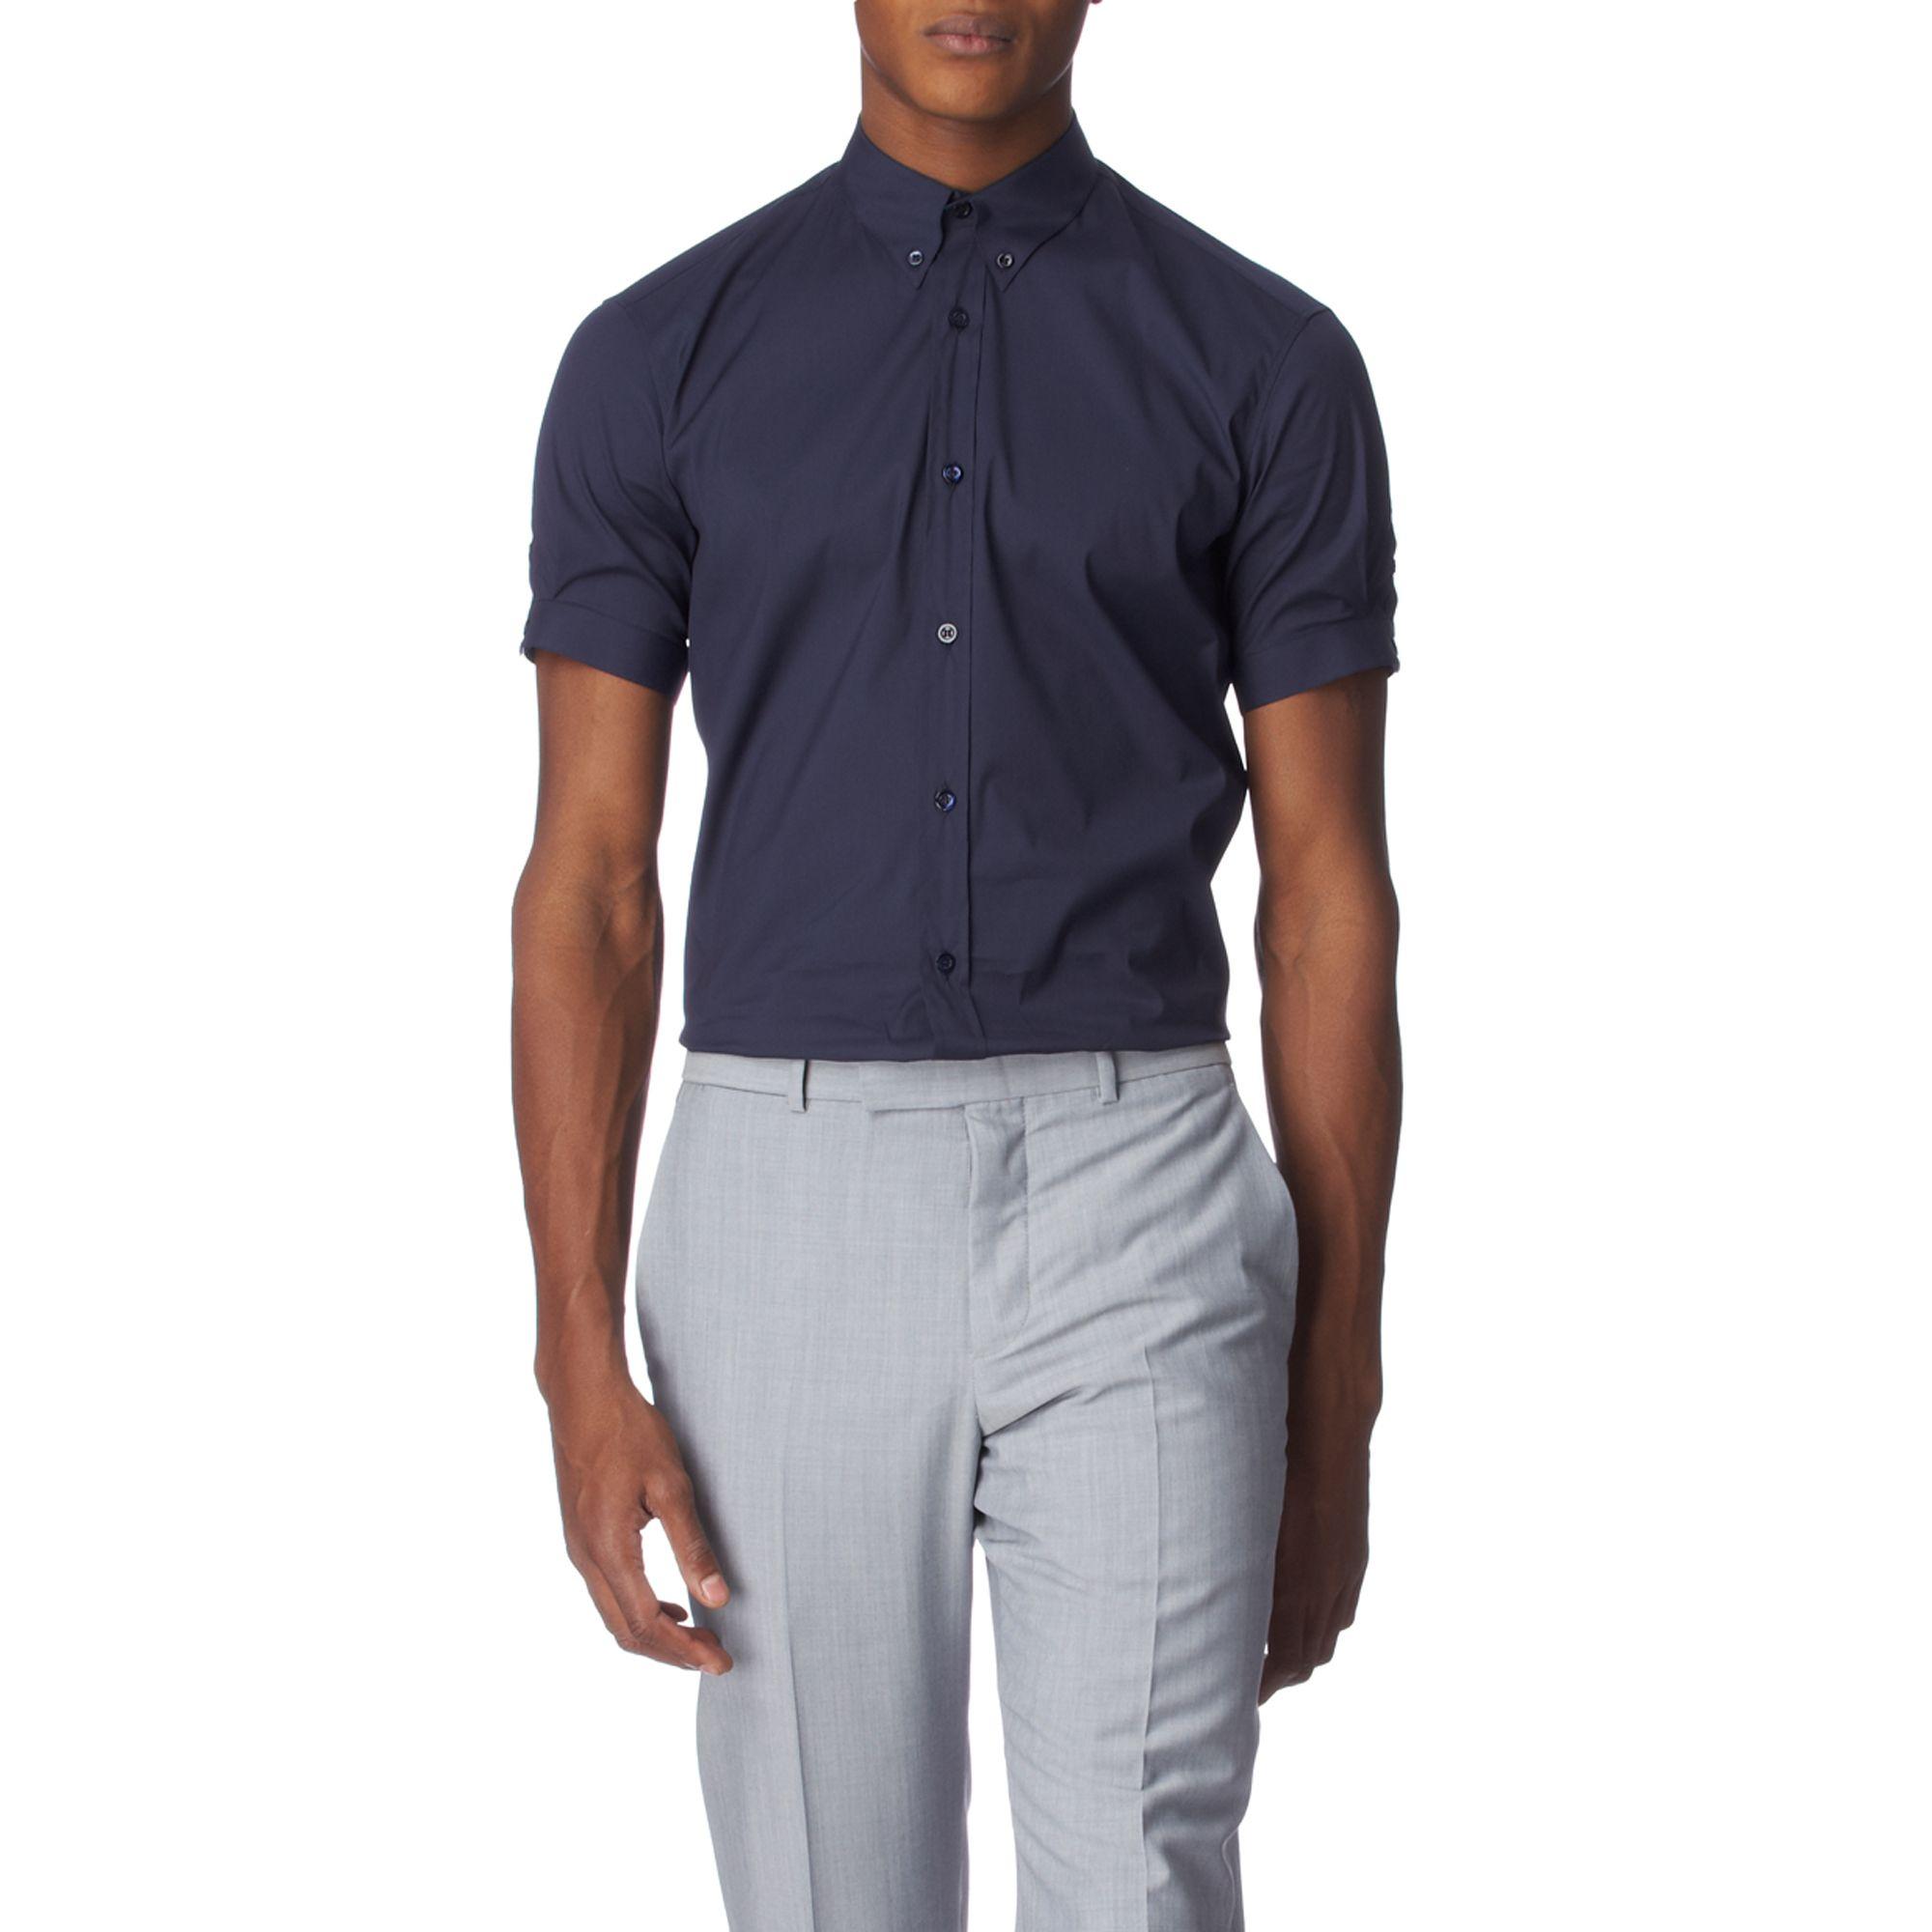 alexander mcqueen brad pitt slim fit stretchcotton shirt